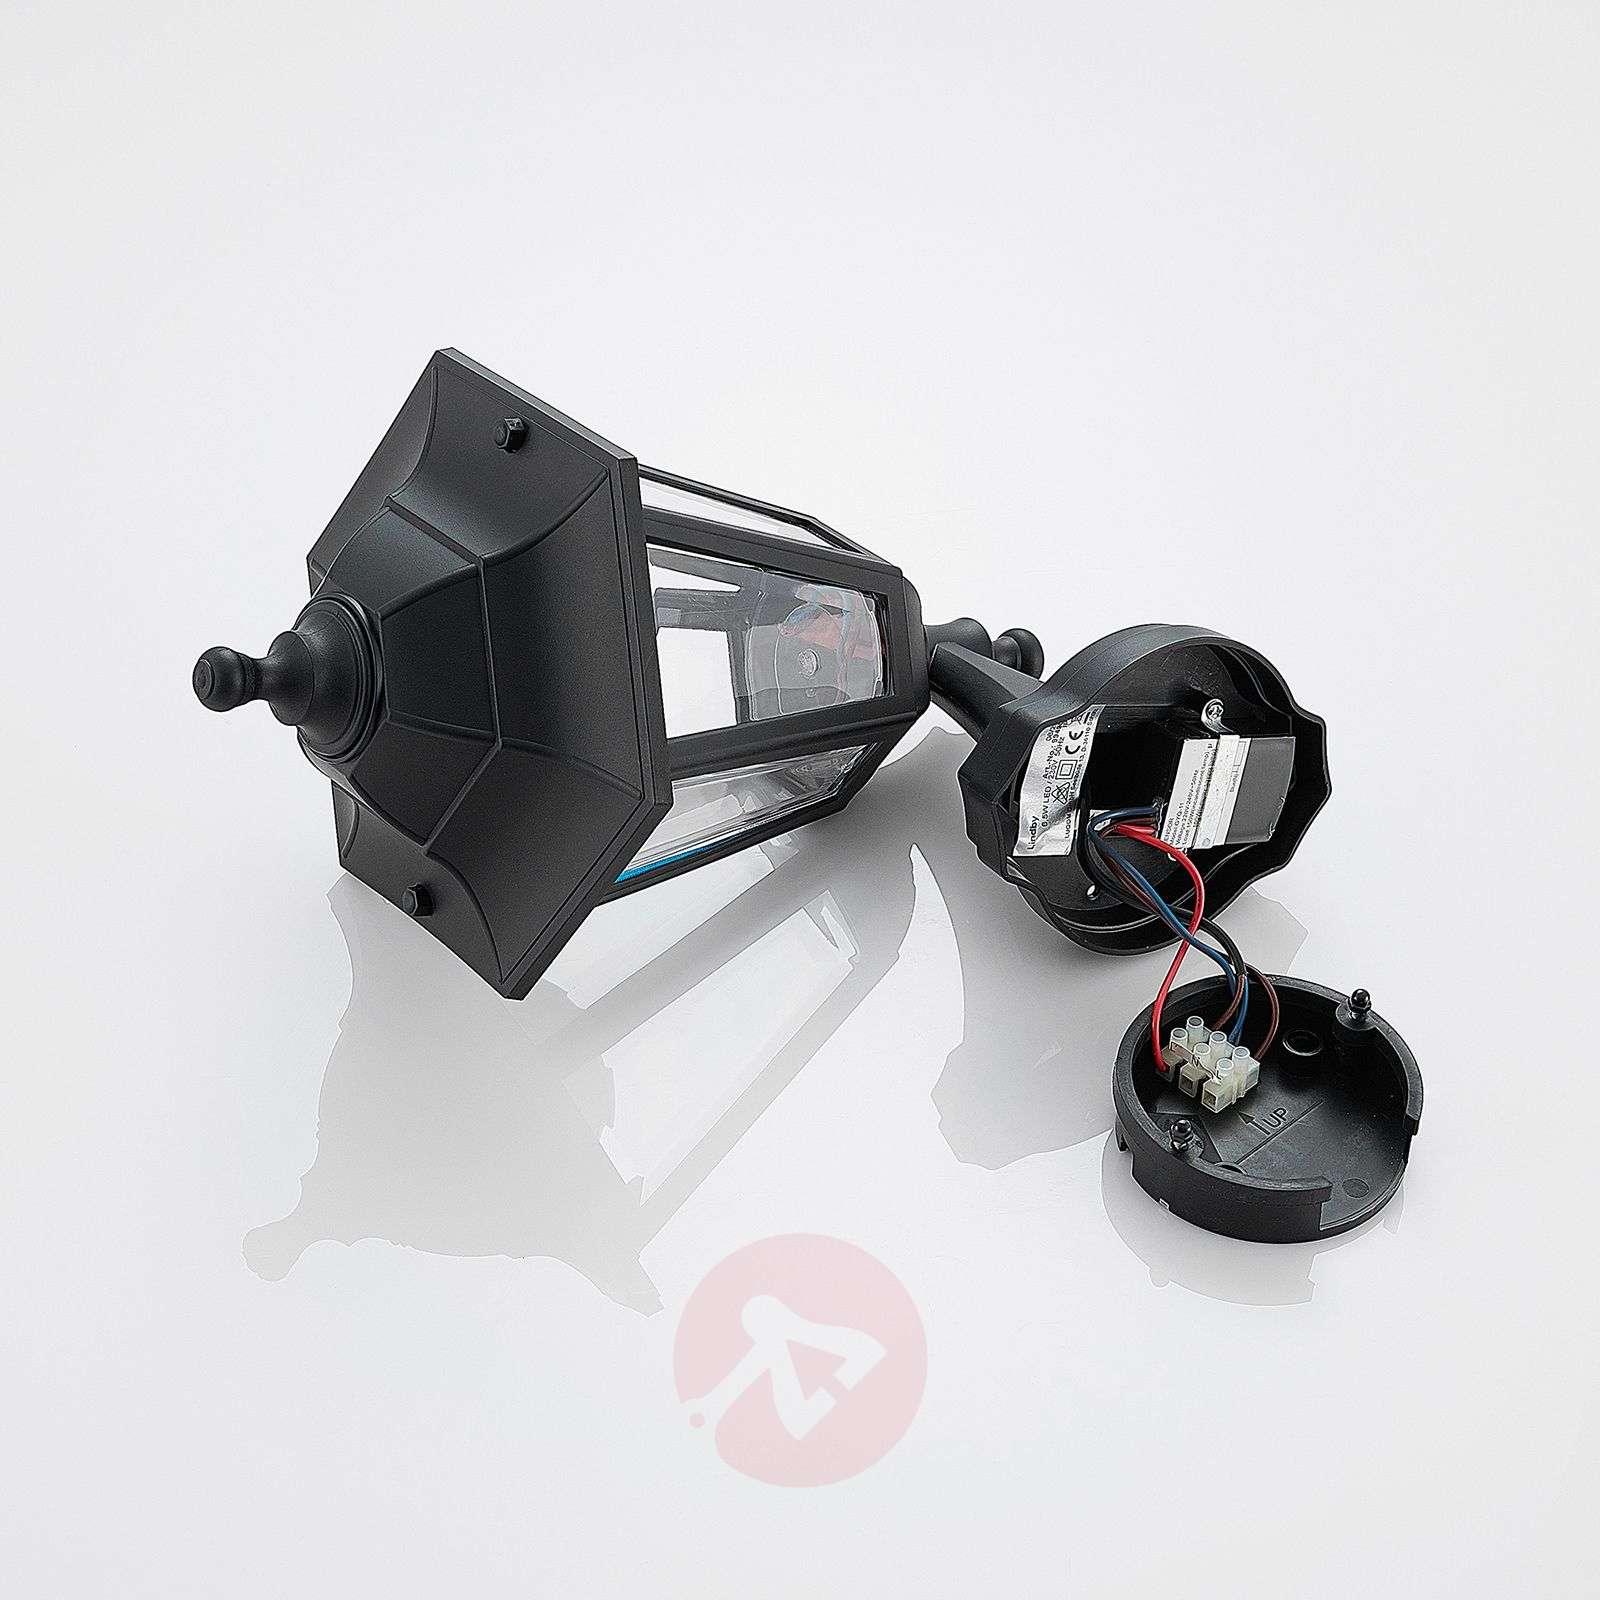 LED-ulkoseinälamppu Iavo, anturi-9949027-01